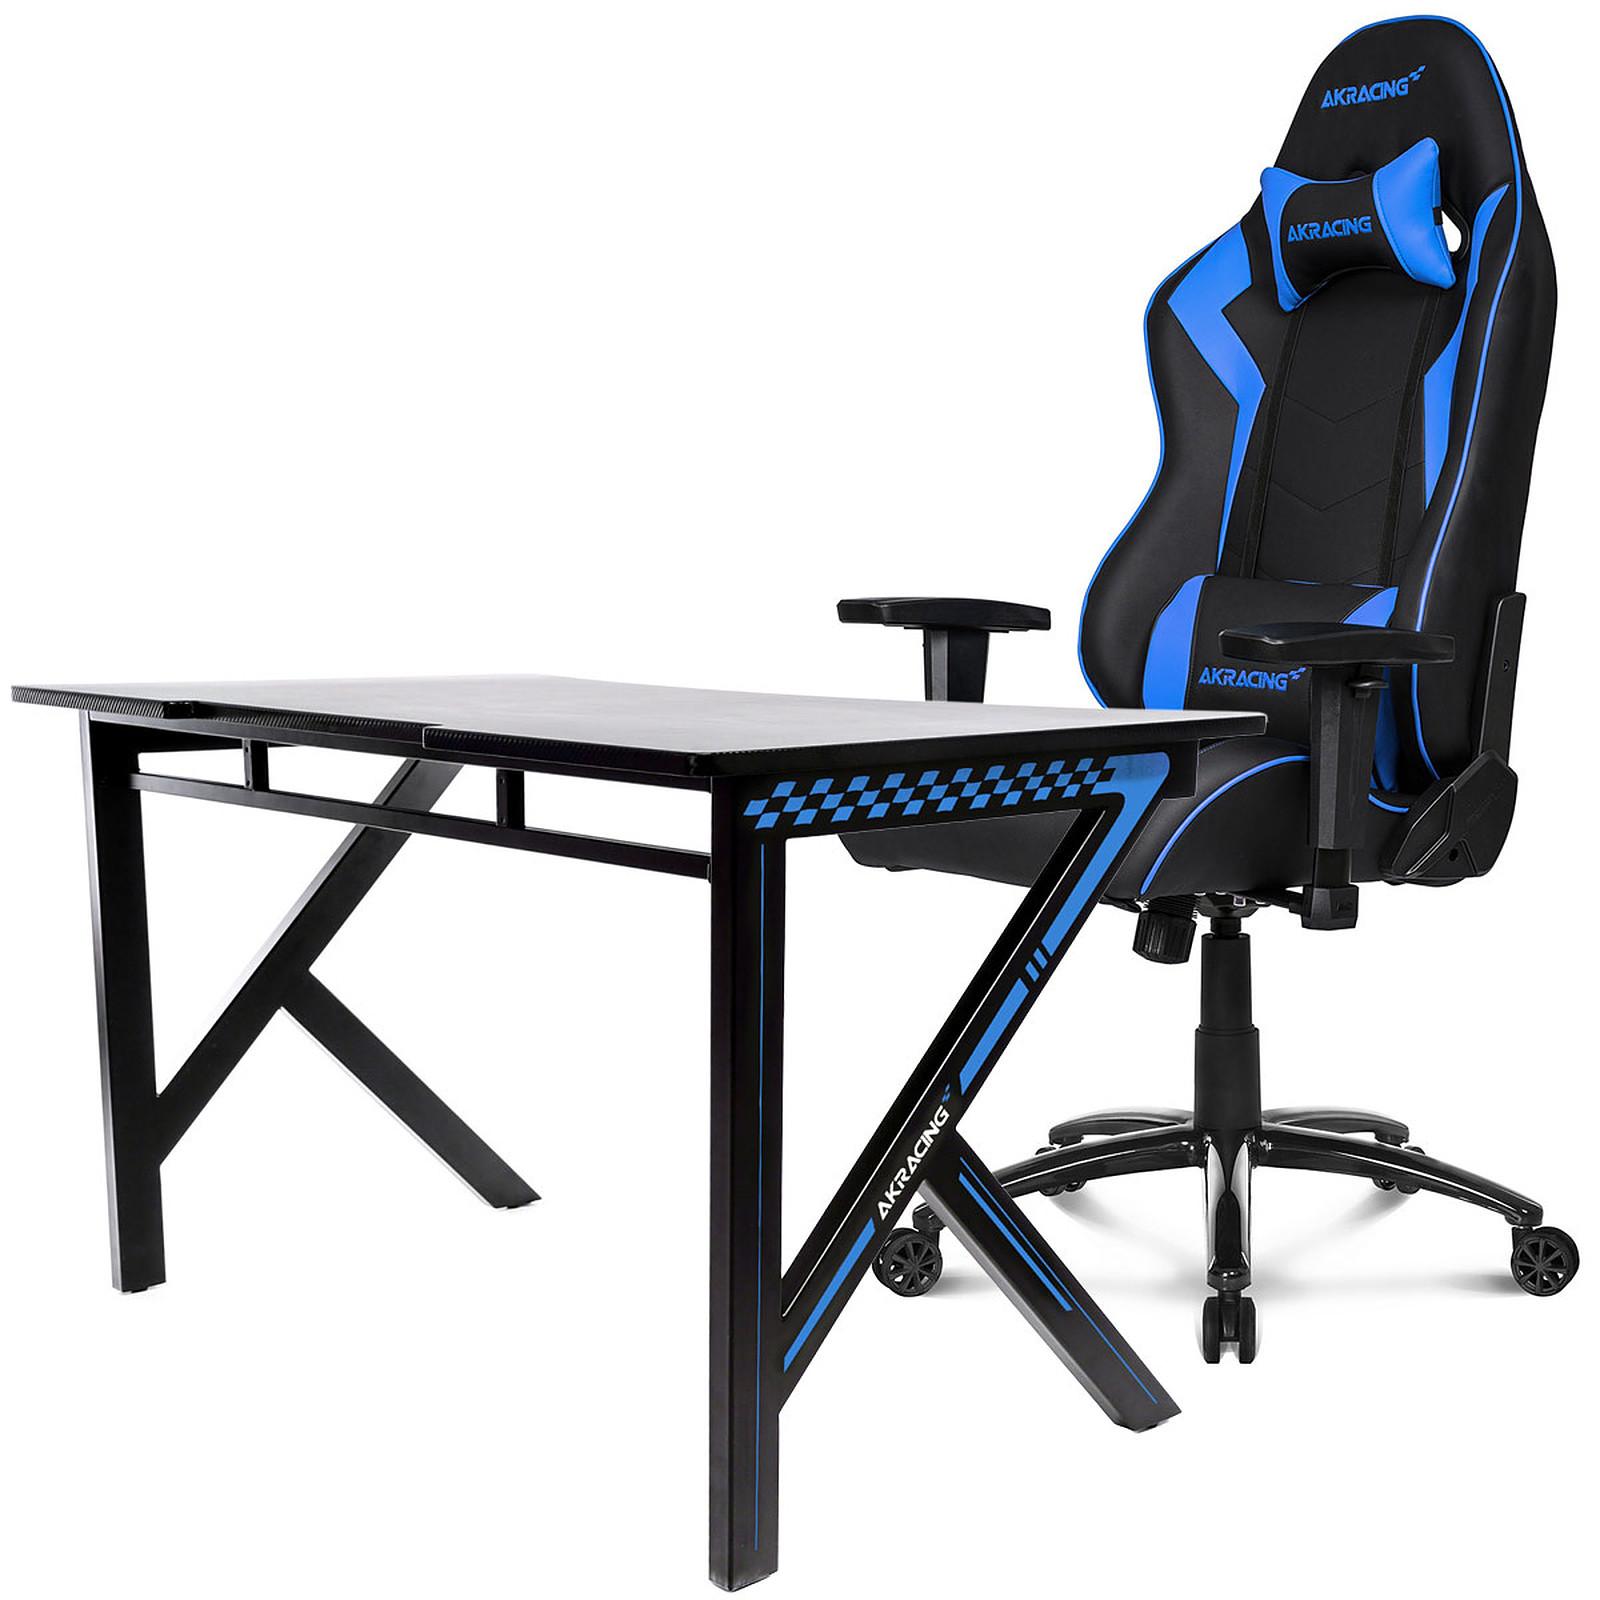 AKRacing Gaming Setup SX Bleu